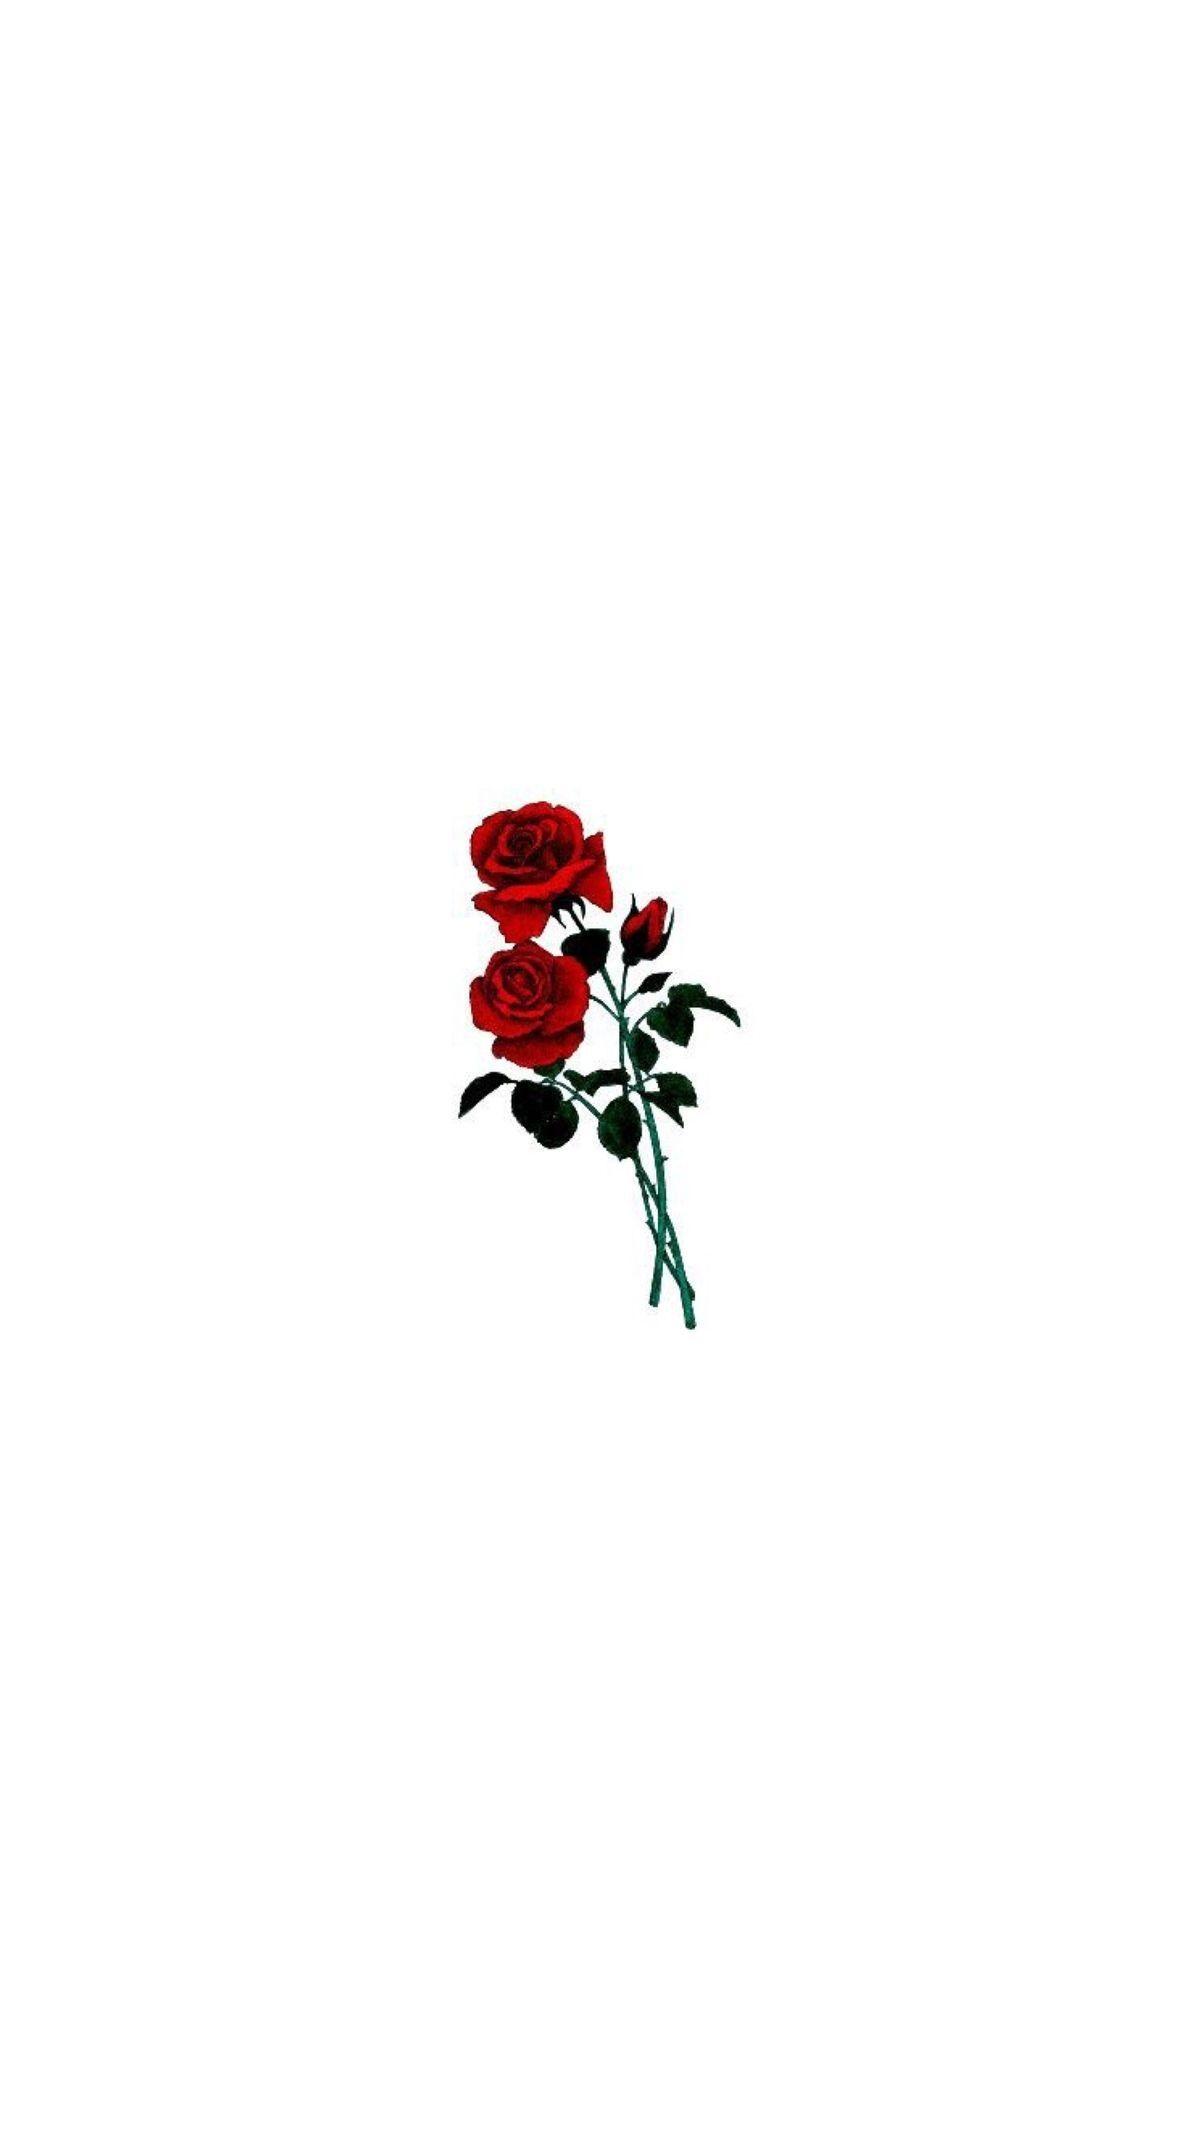 Rose wallpaper 🌹 Rose wallpaper, Art wallpaper, Simple